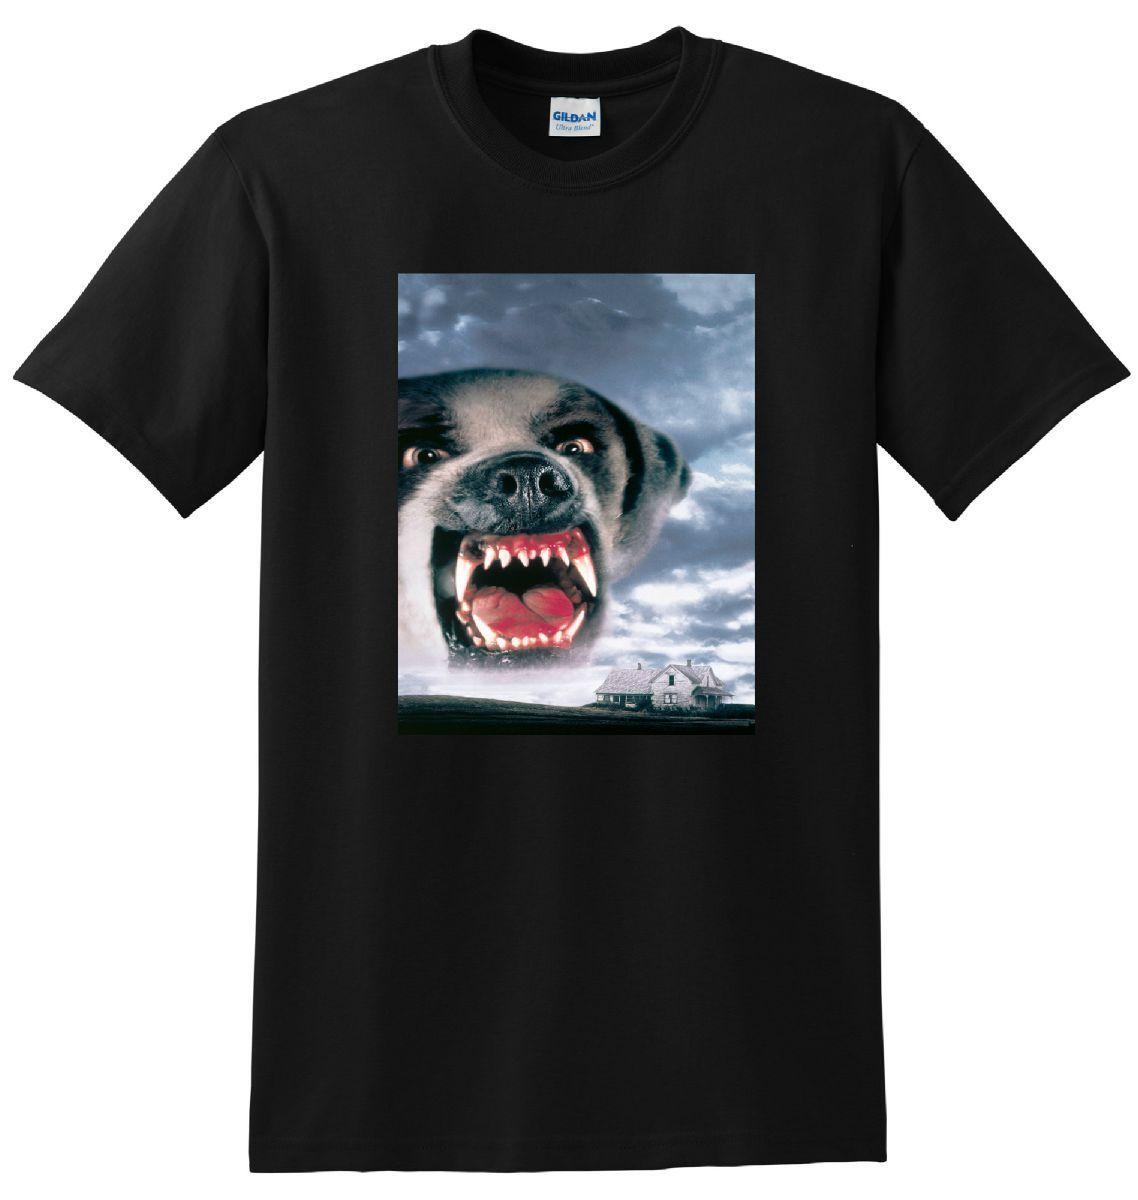 * NIEUWE * CUJO T-SHIRT Bluray Dvd Poster Tee 2018 Nieuwe 100% Katoenen T-Shirts Mannen T-Shirt voor Mannen/ jongen Korte Mouw Cool Tees